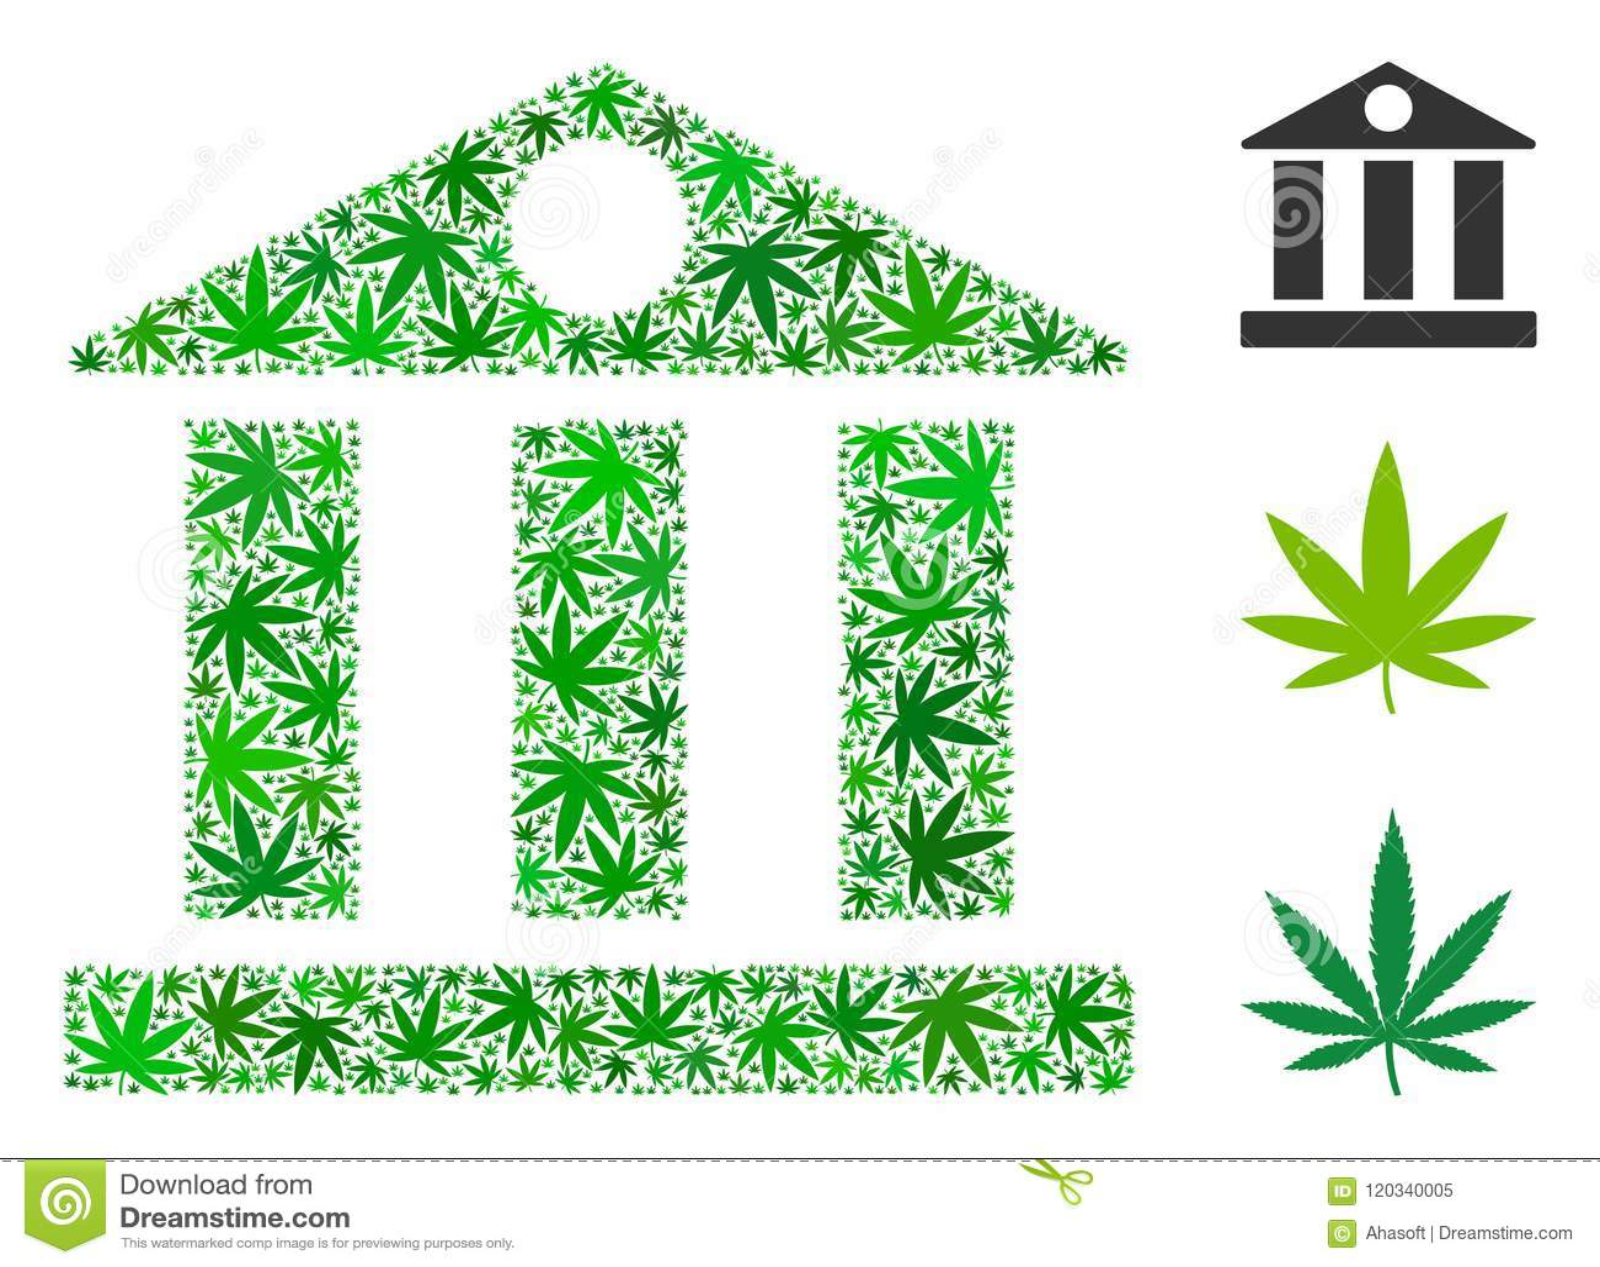 Bank Building Collage Of Marijuana Stock Vector Illustration Of